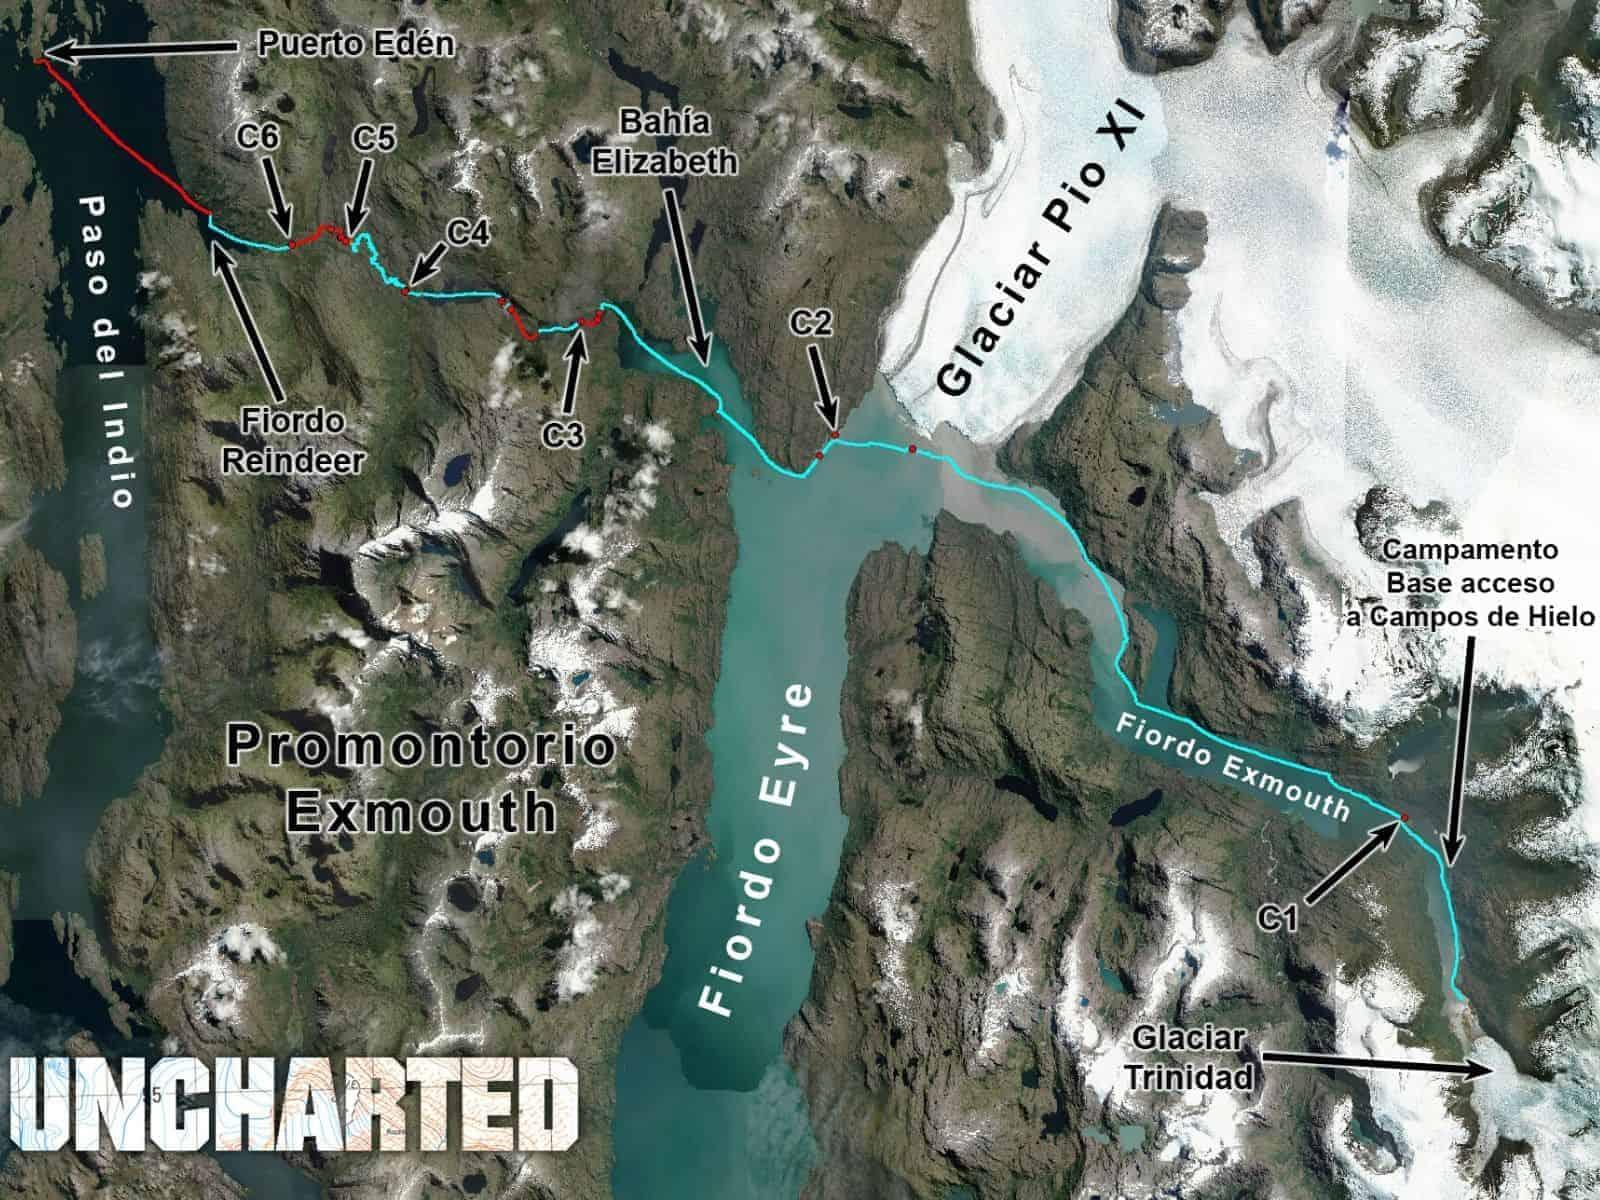 Kayak Glaciar Trinidad 19